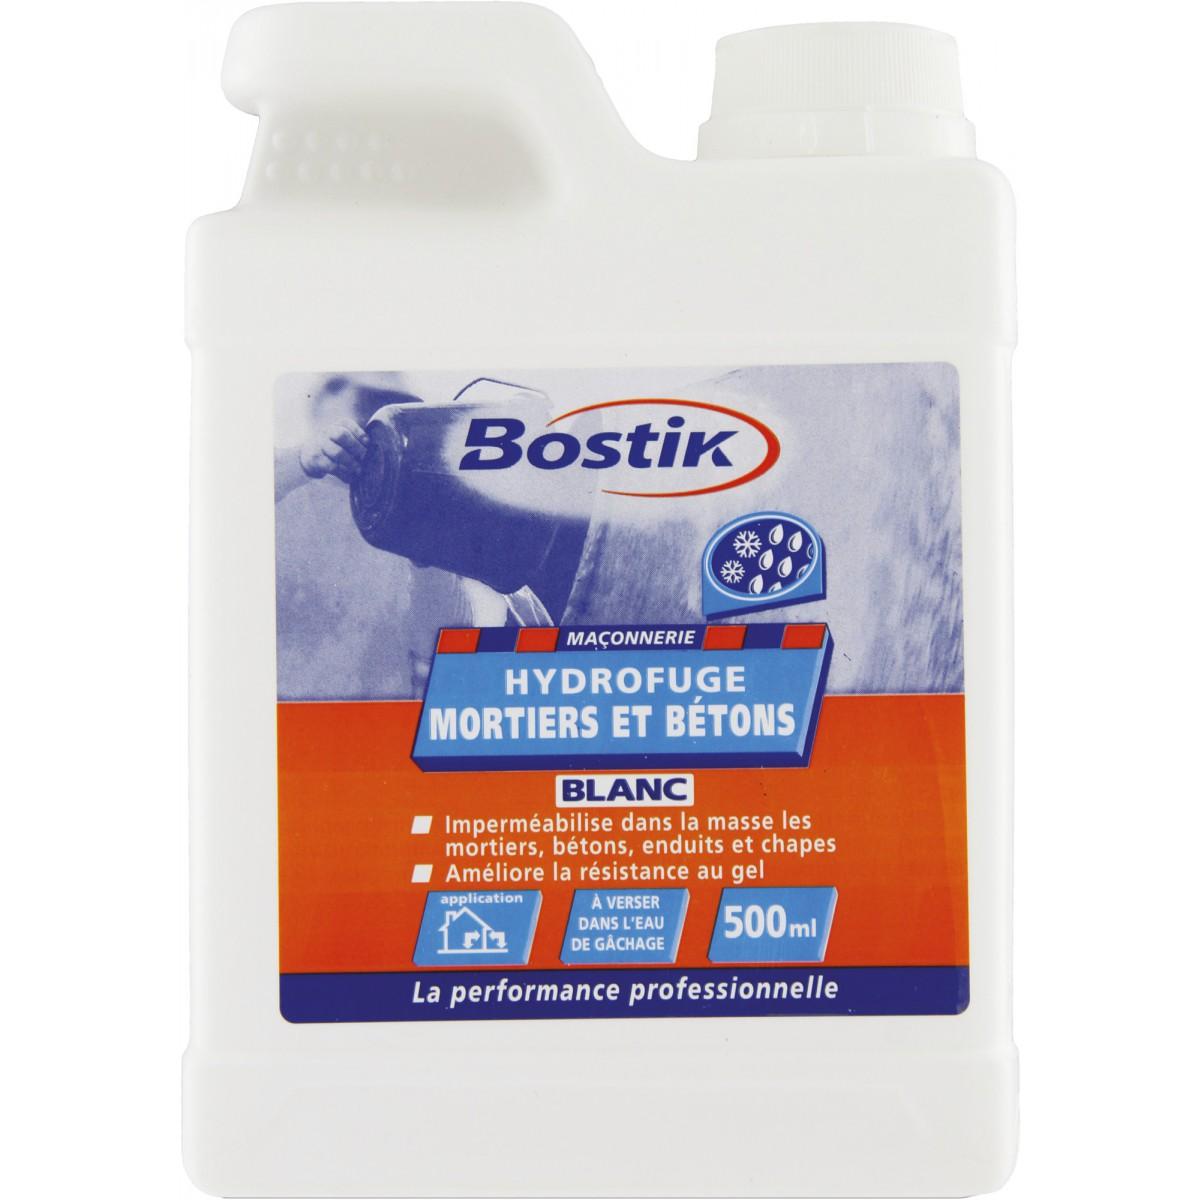 Hydrofuge liquide Bostik - Flacon 500 ml